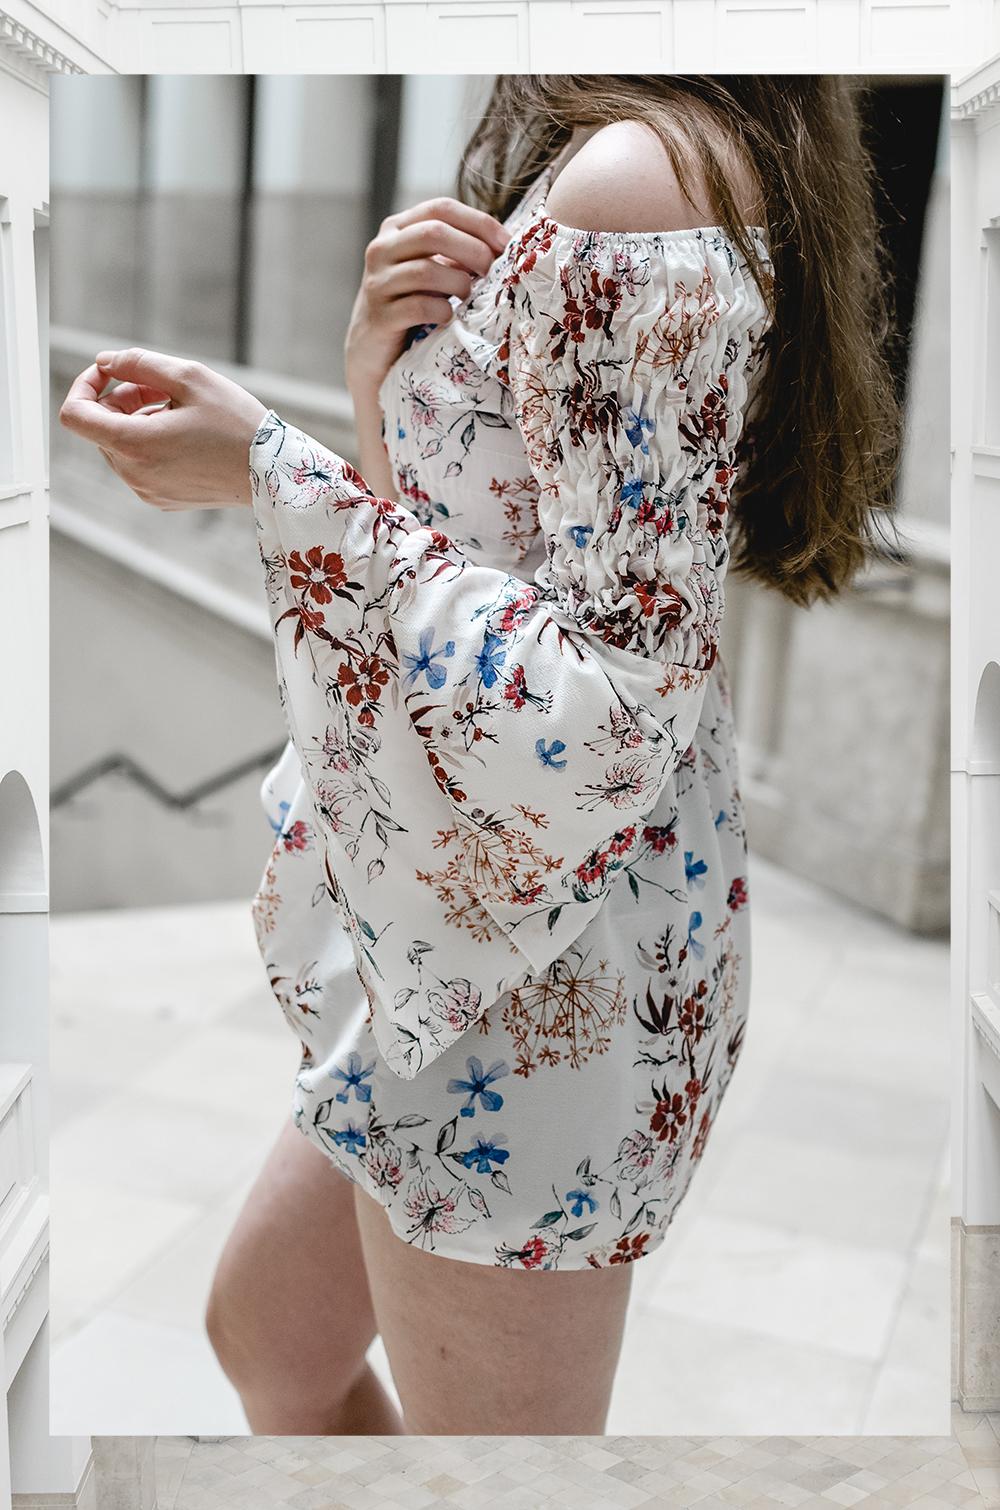 Denim Sommerlook-Sommerlook aufwerten-Jeans Shorts Outfit-Modeblogger-andysparkles